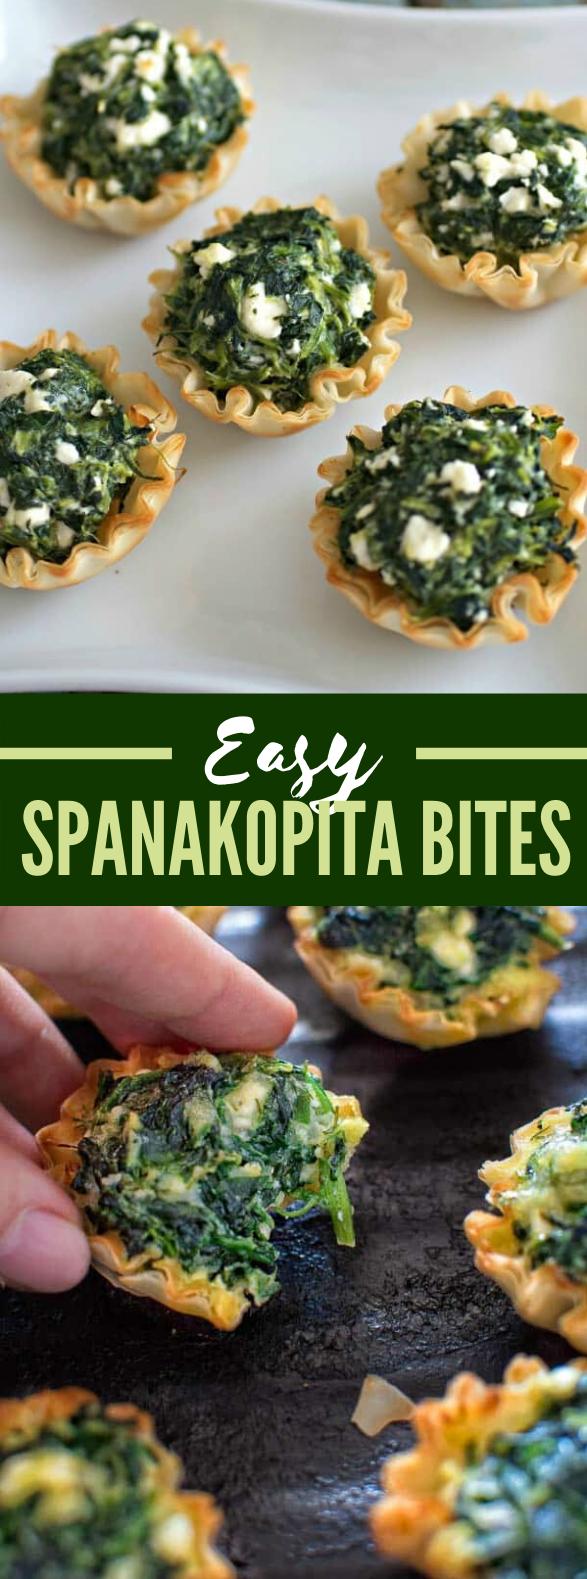 EASY SPANAKOPITA BITES #vegetarian #appetizers